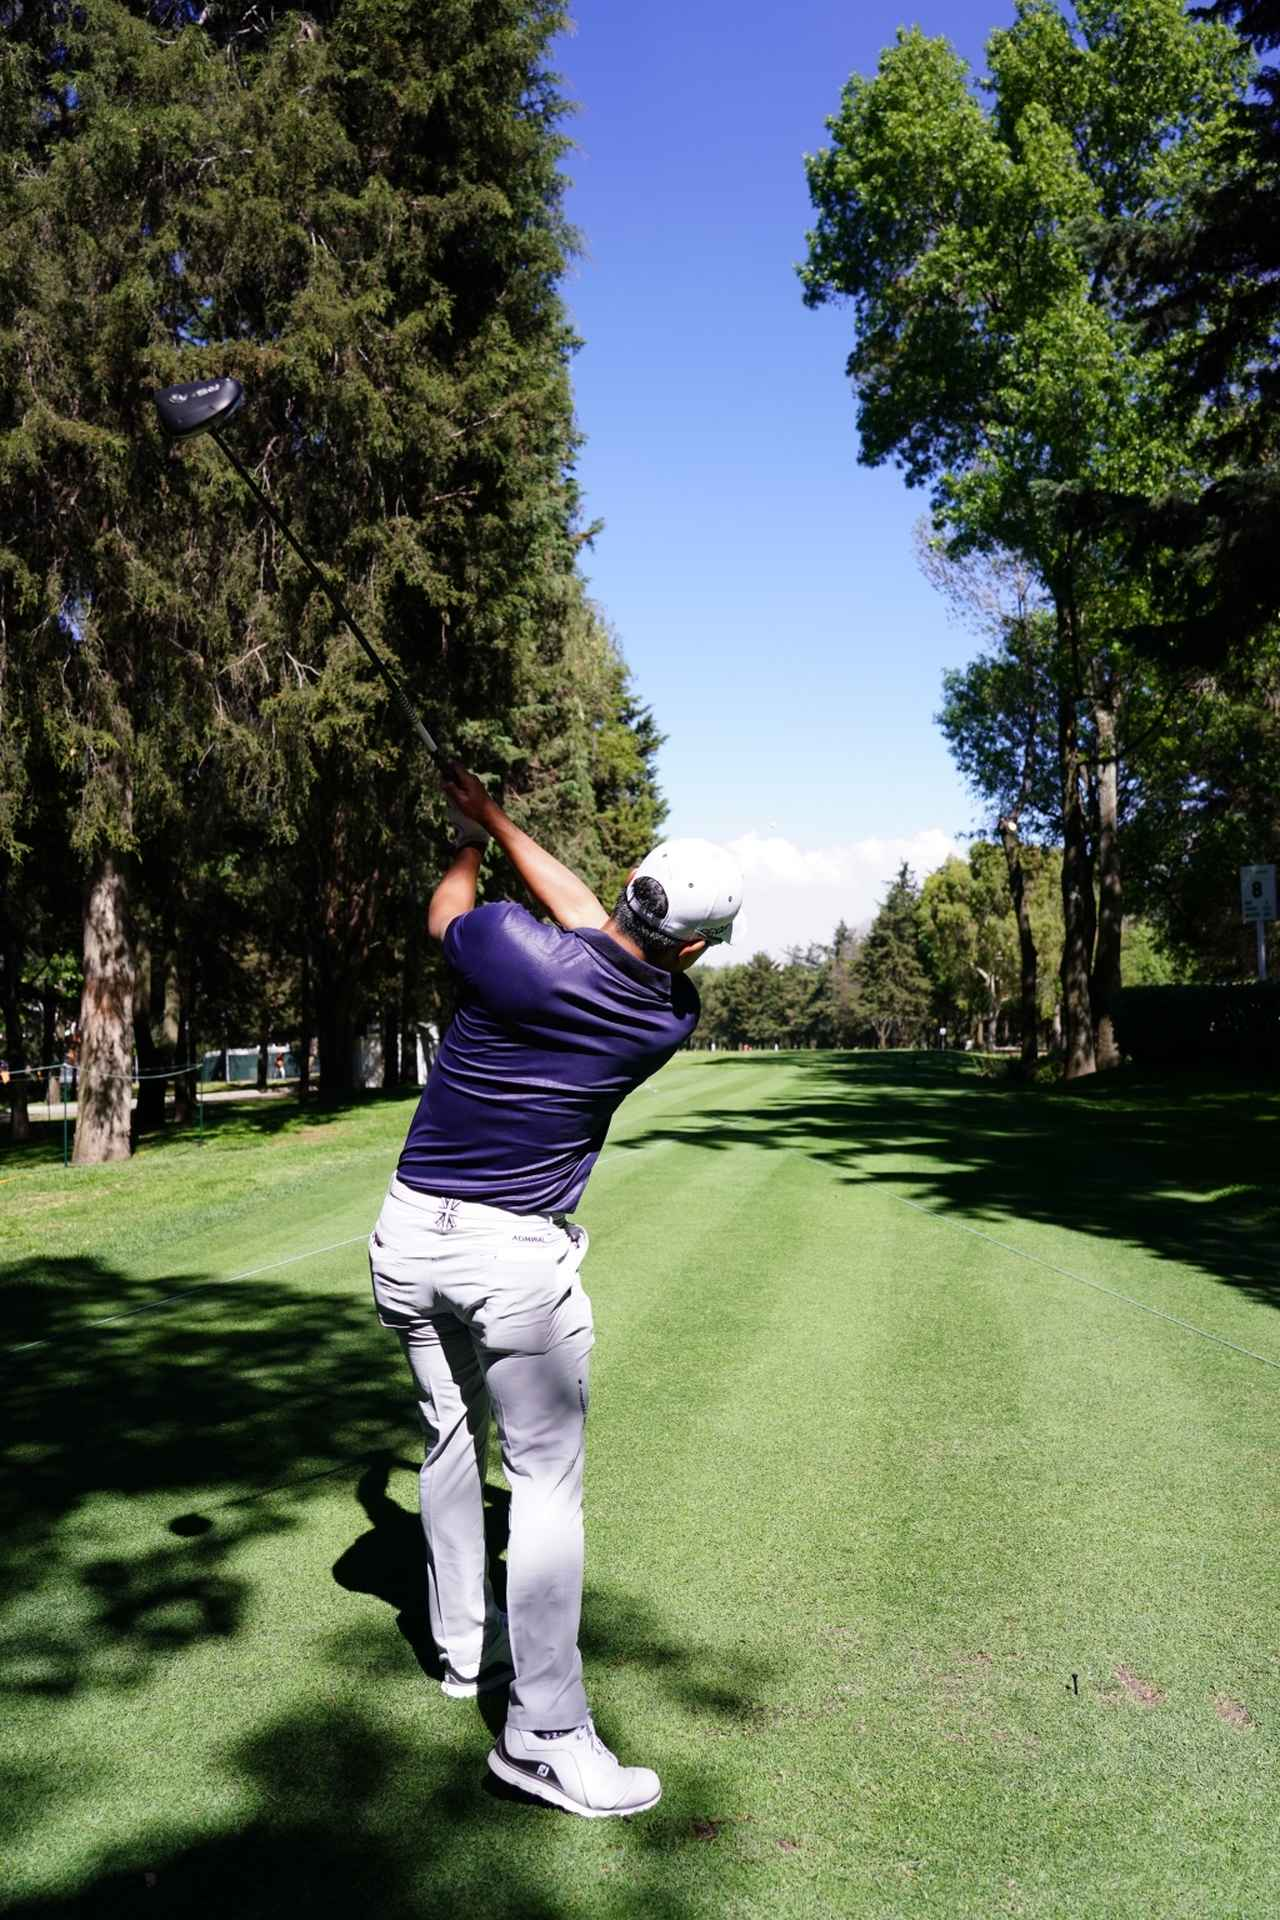 Images : 12番目の画像 - 小平智のドライバー連続写真 - みんなのゴルフダイジェスト